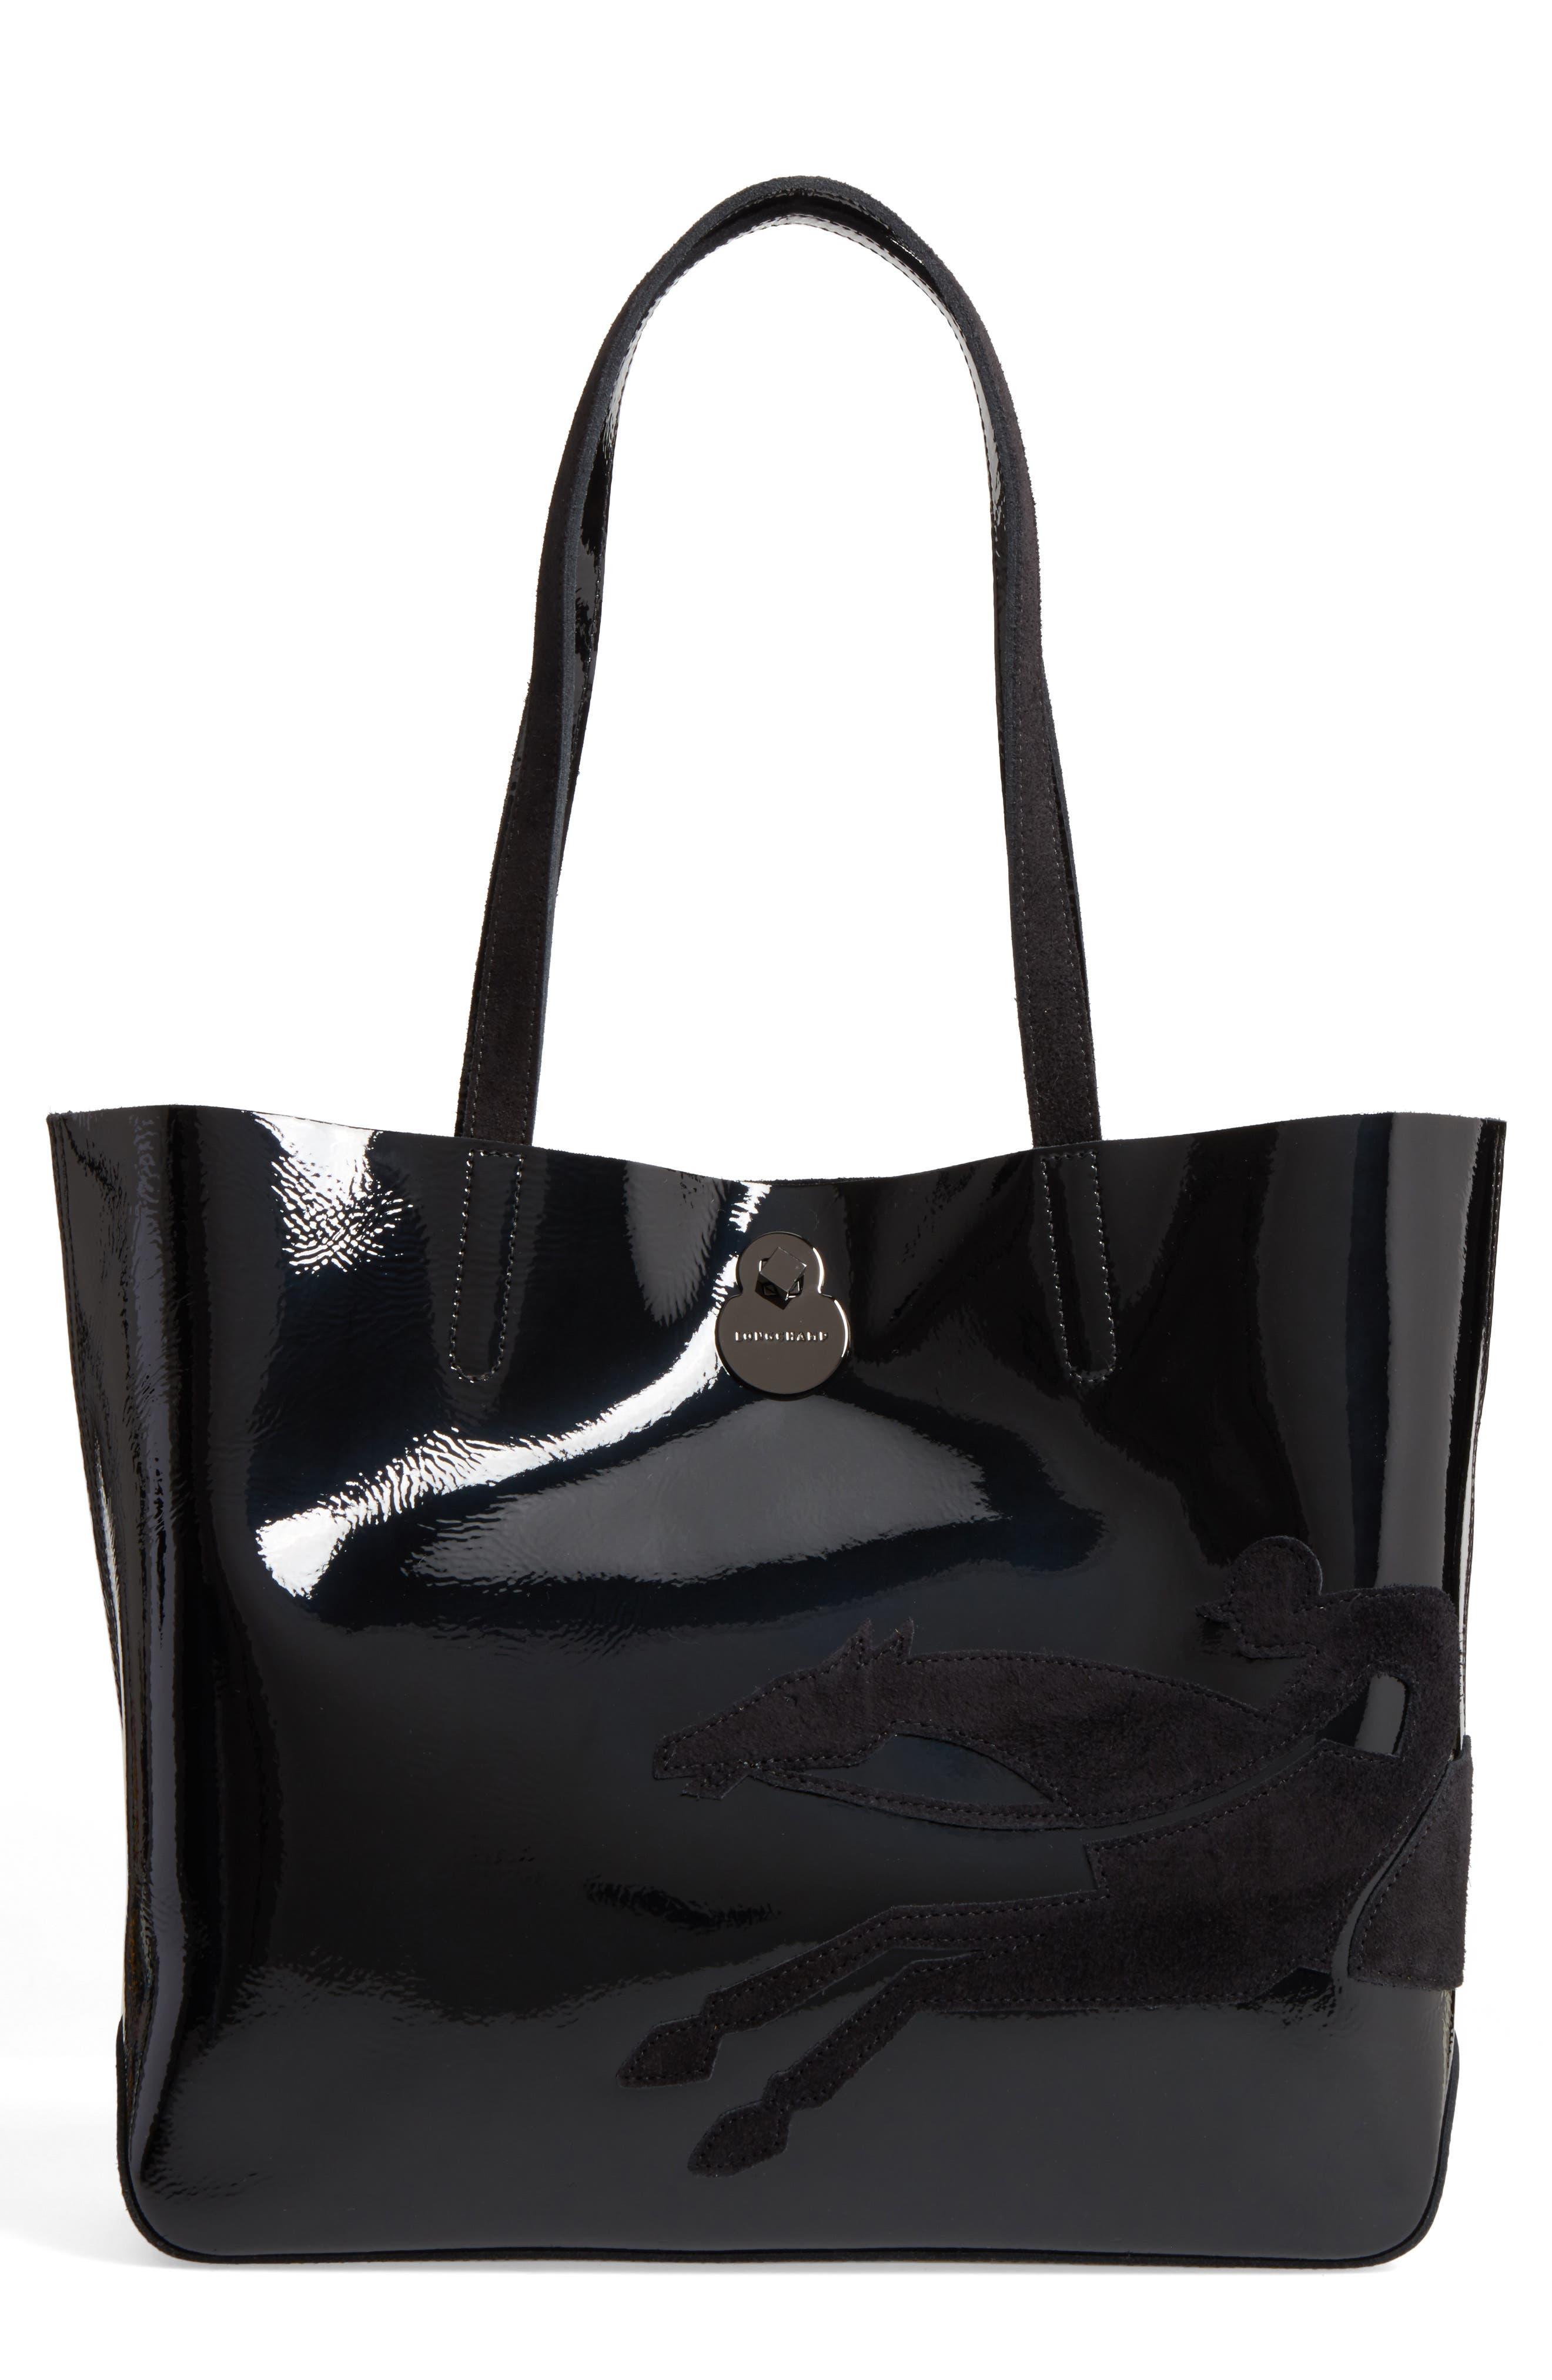 LONGCHAMP Shop-It Leather Tote